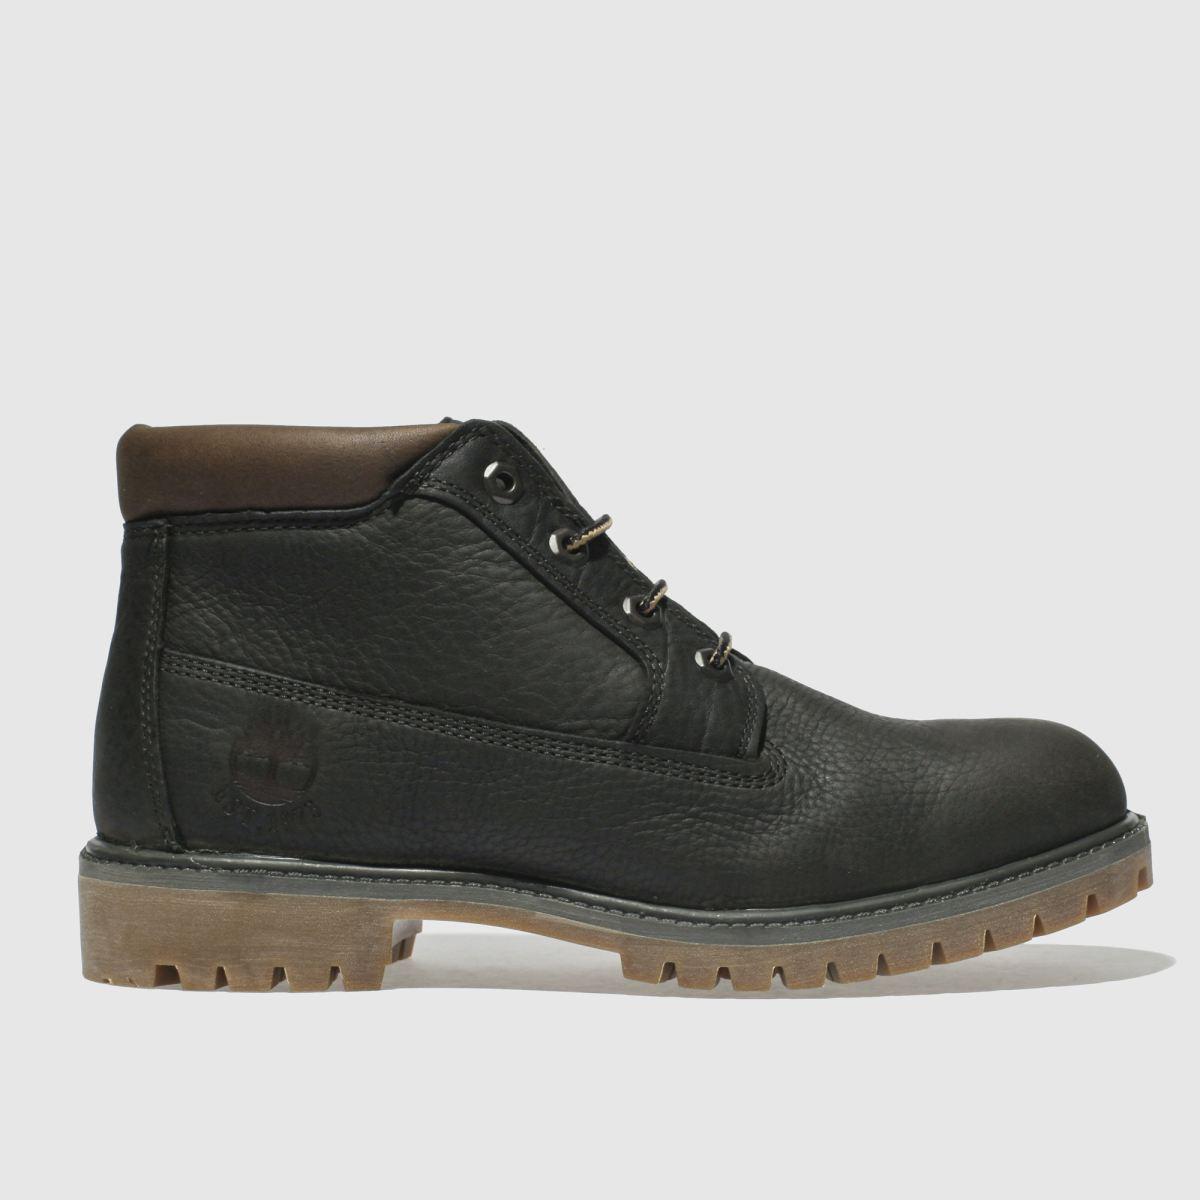 Timberland Dark Green Premium Chukka Ltd Boots